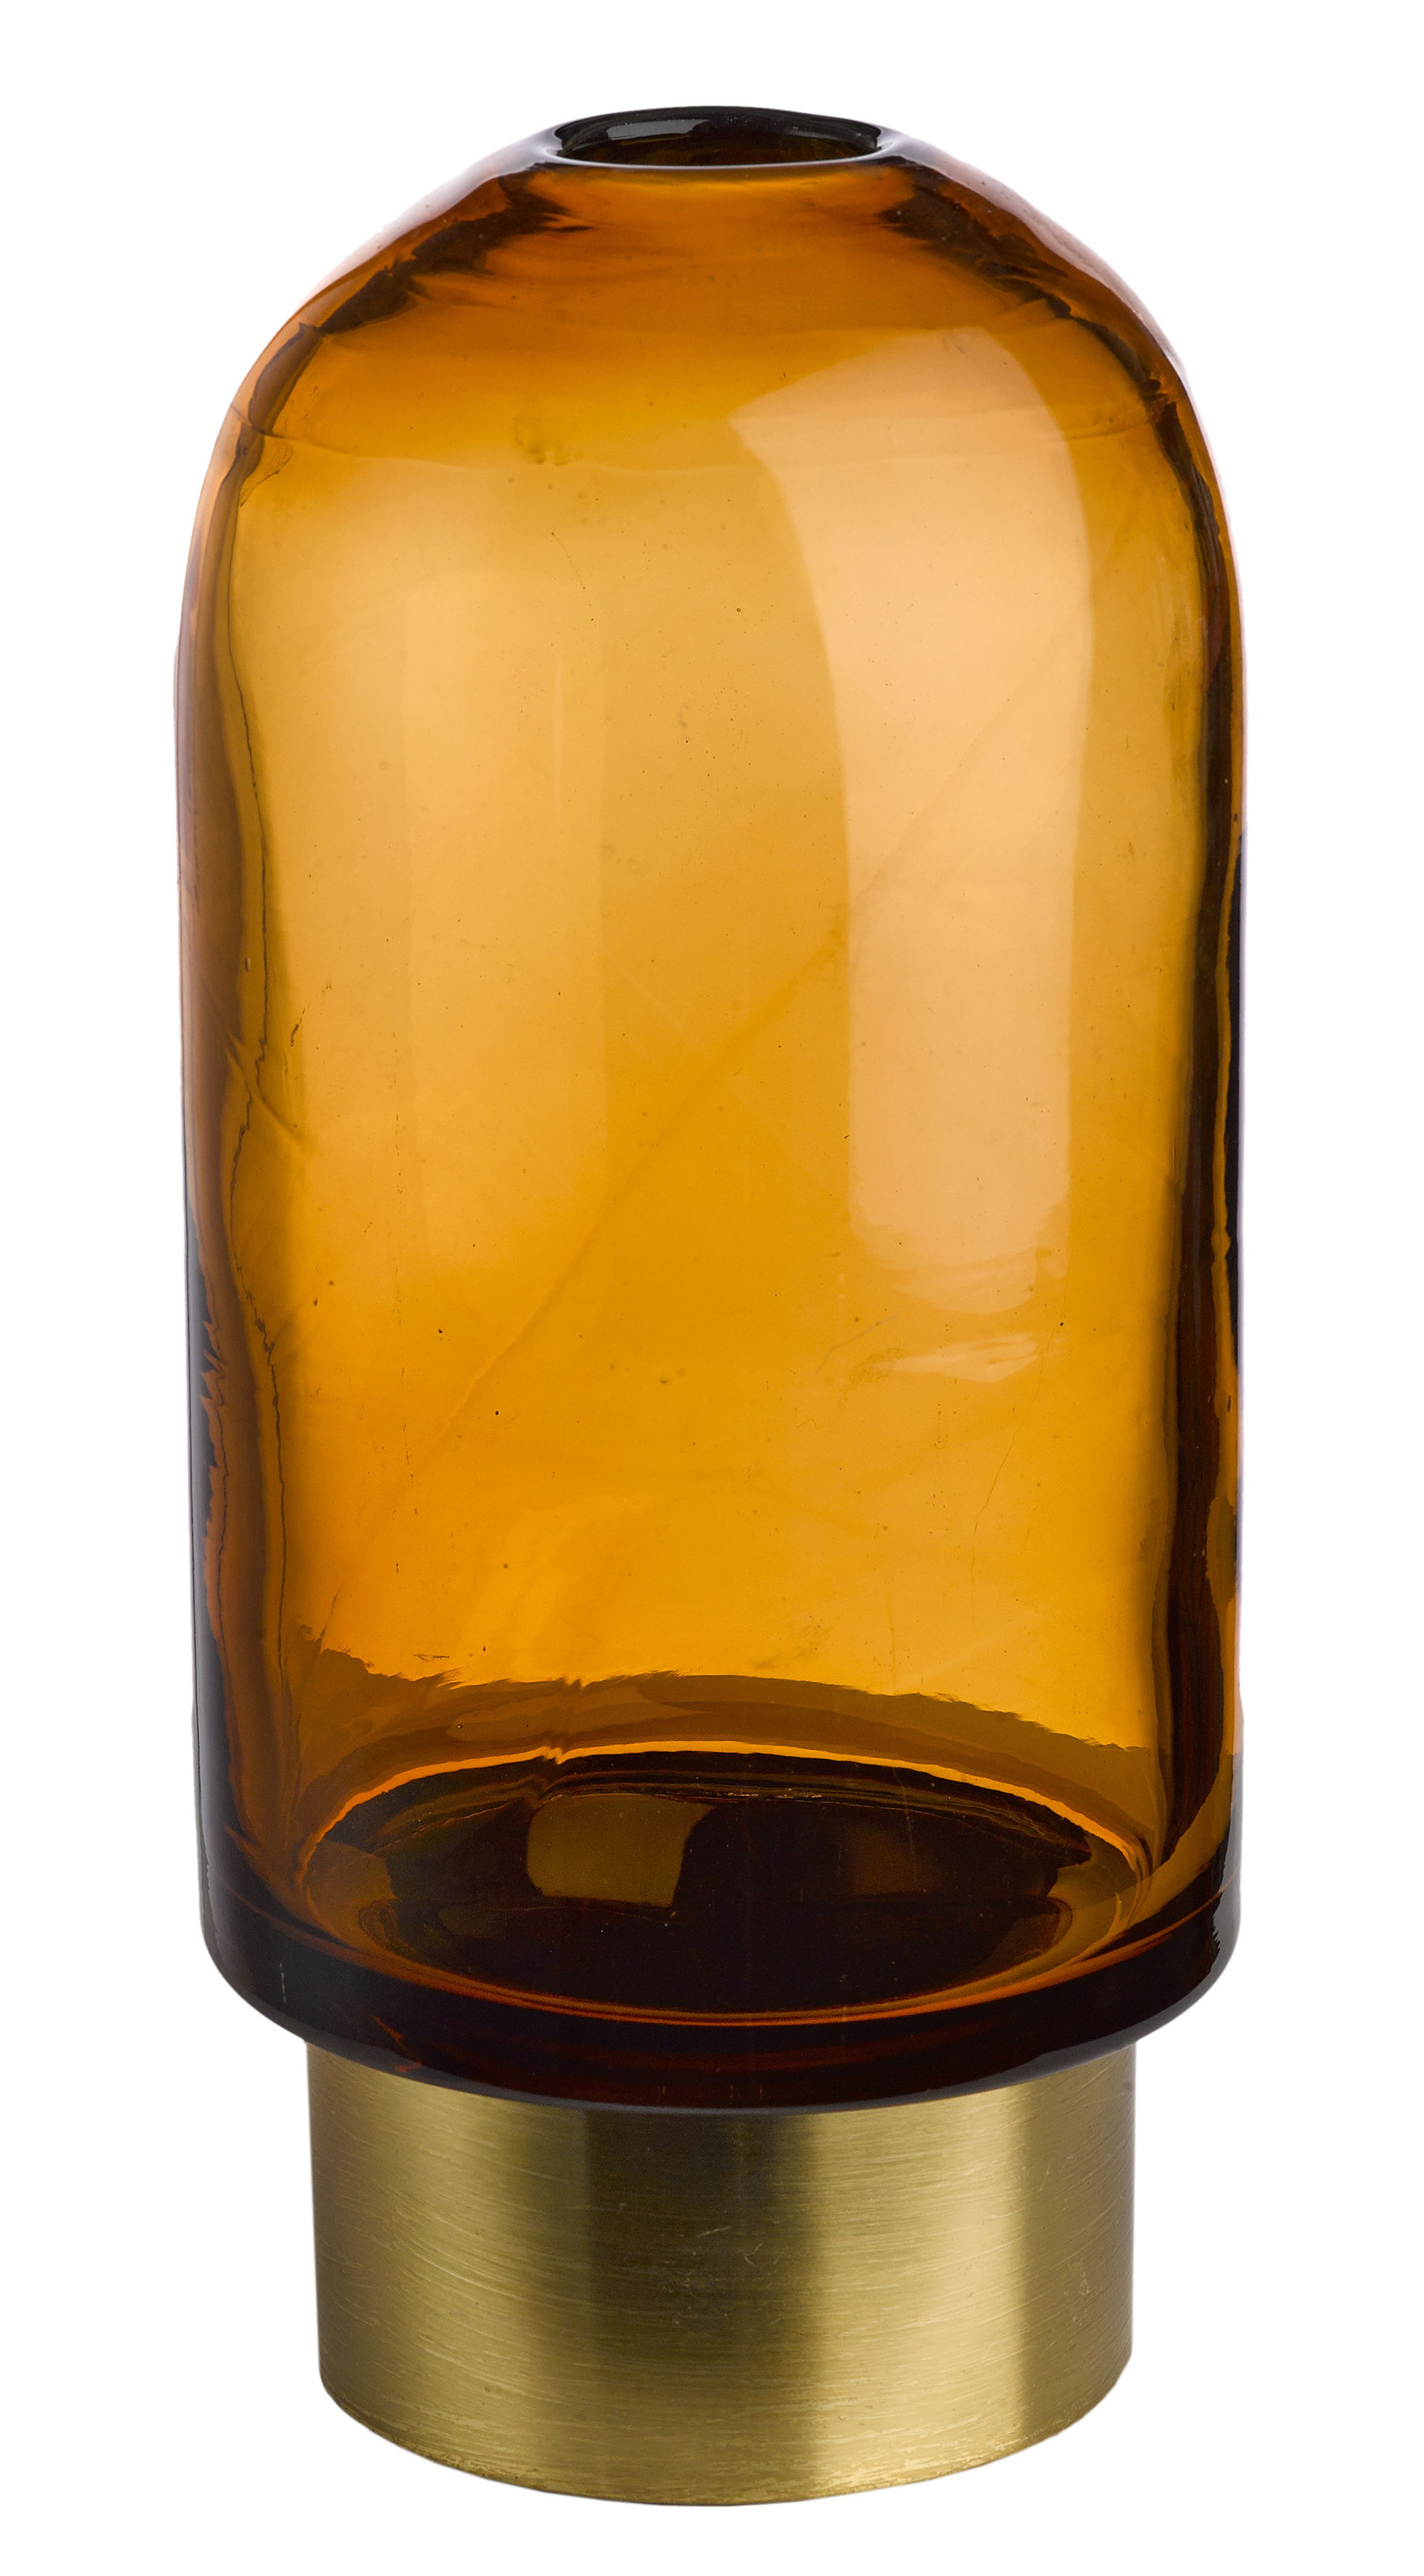 Interni - Vasi - Vaso Belt Bullet - / Bicchiere & Ottone - H 26 cm di Pols Potten - Ambra / Ottone - Ottone, Vetro